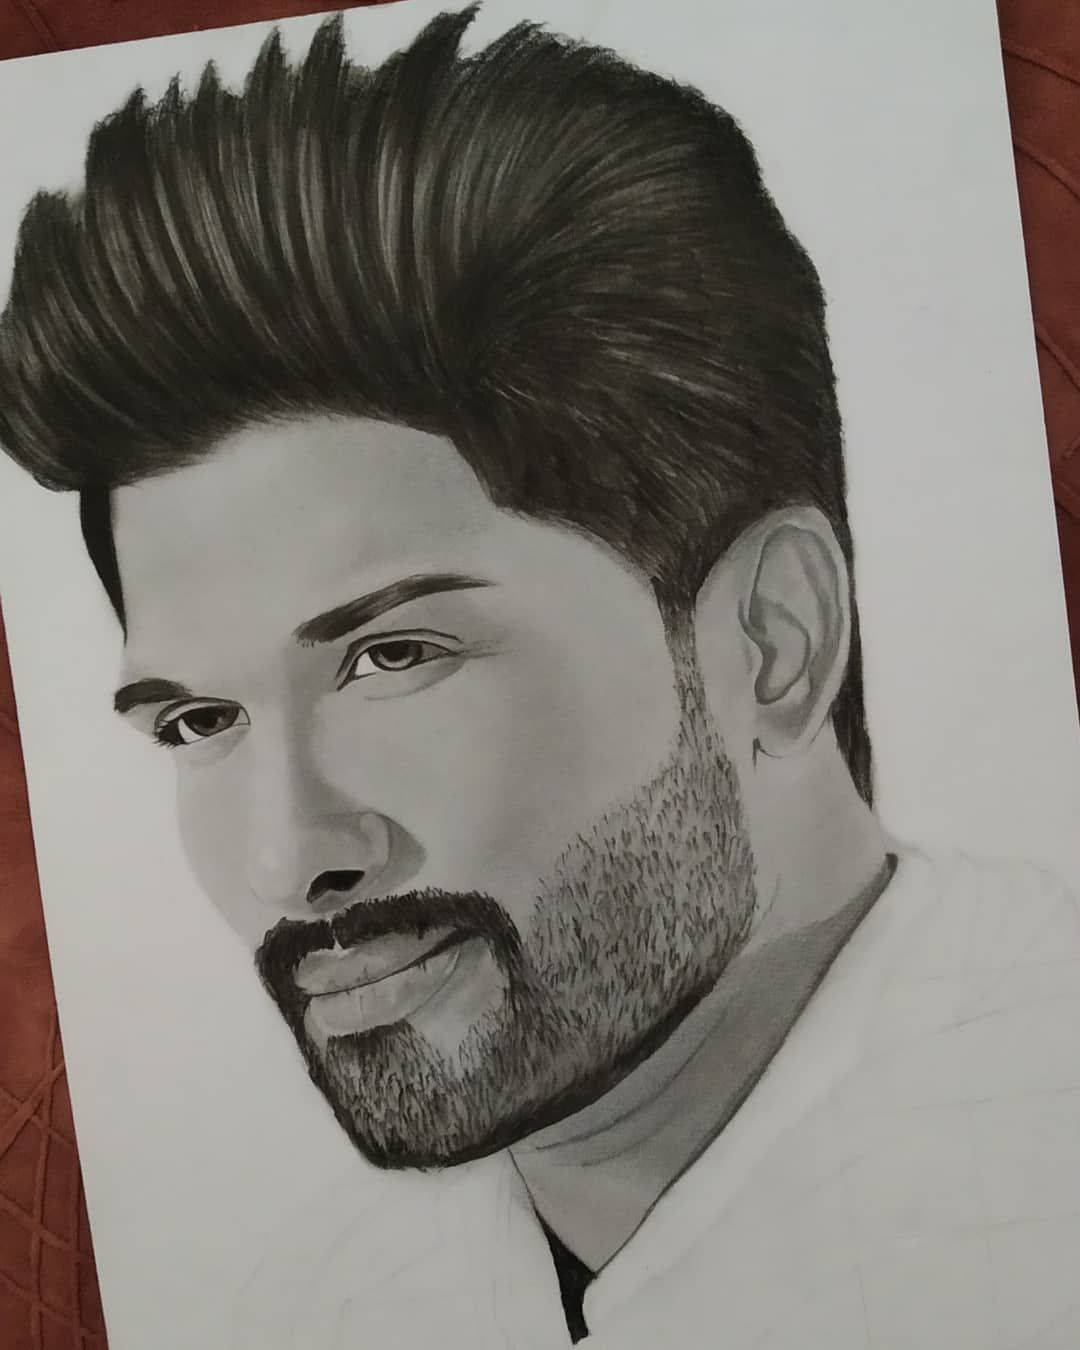 Allu Arjun Portrait Sketch By Me Artist Affy Alluarjun Allu Arjun Southindia Art Toptags Artist Pencilsketc Portrait Sketches Artist Instagram Posts